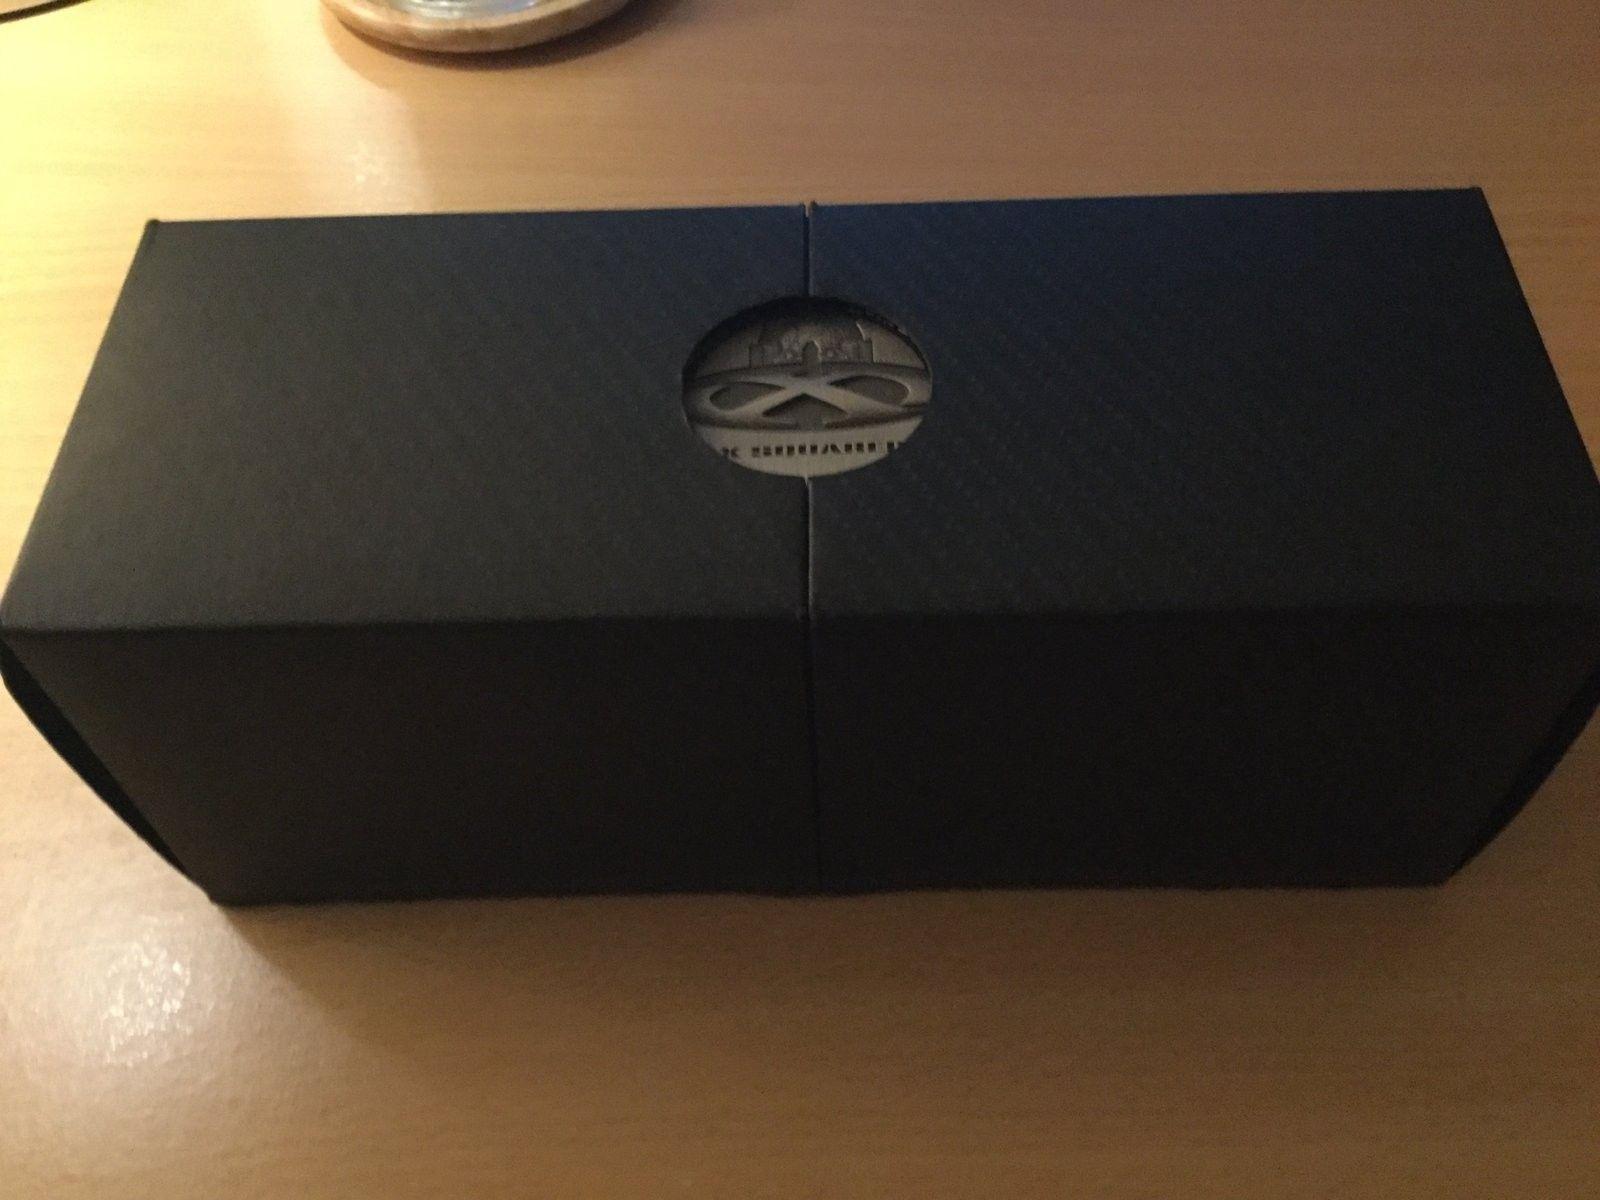 X Squared Carbon Black: BOX - IMG_1975.JPG